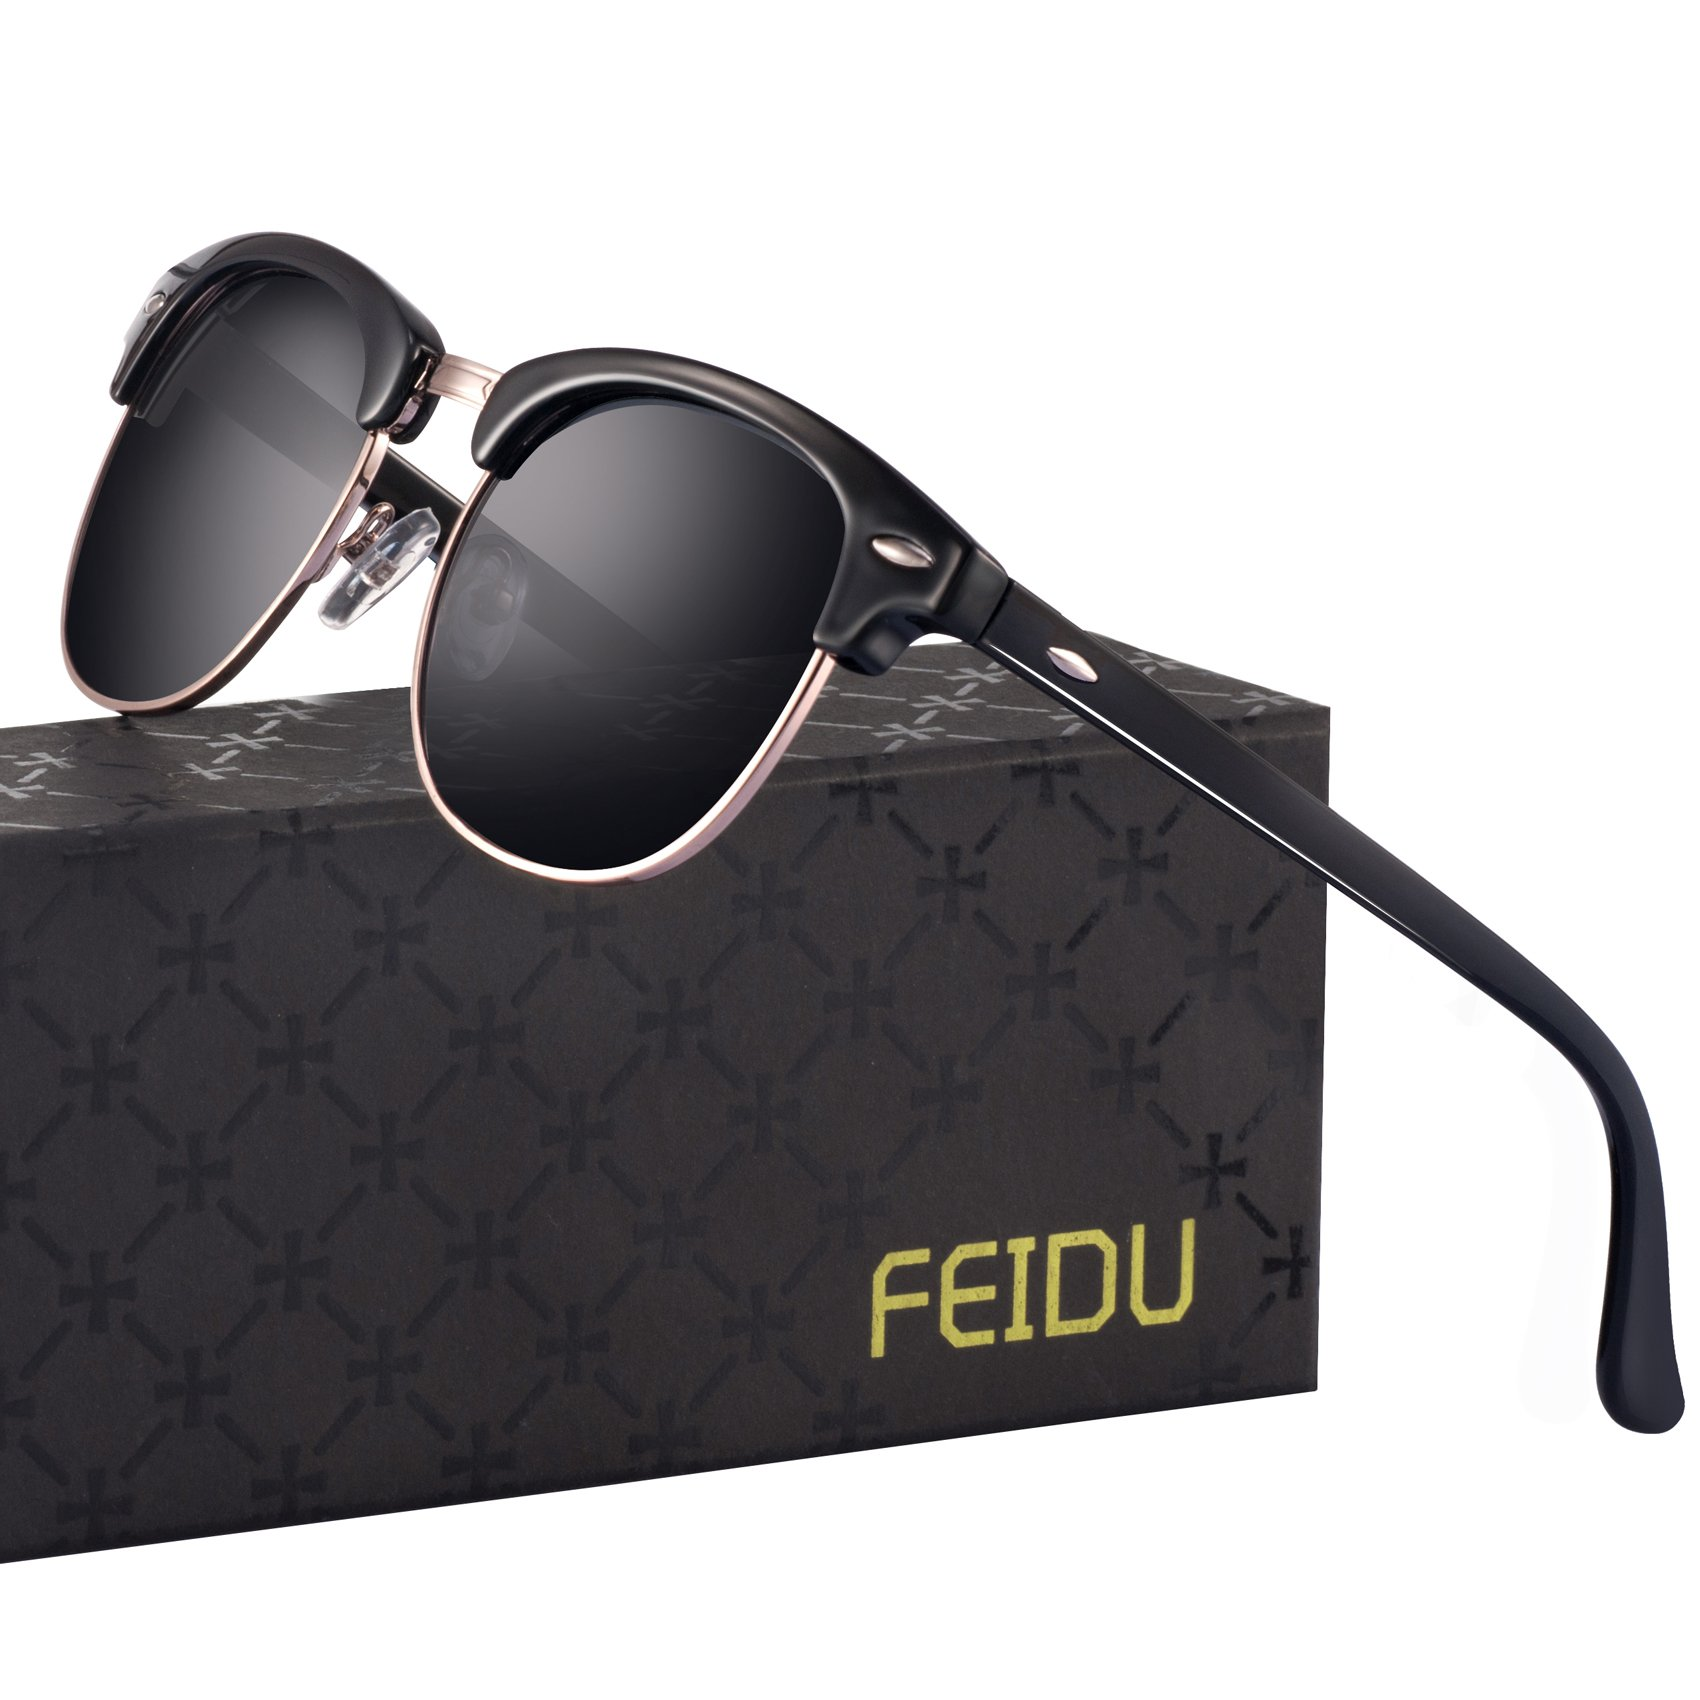 Retro Clubmaster Sunglasses for Men - FEIDU Half Metal Polarized Sunglasses for Women FD3030 (A-black/bright, 2.04)